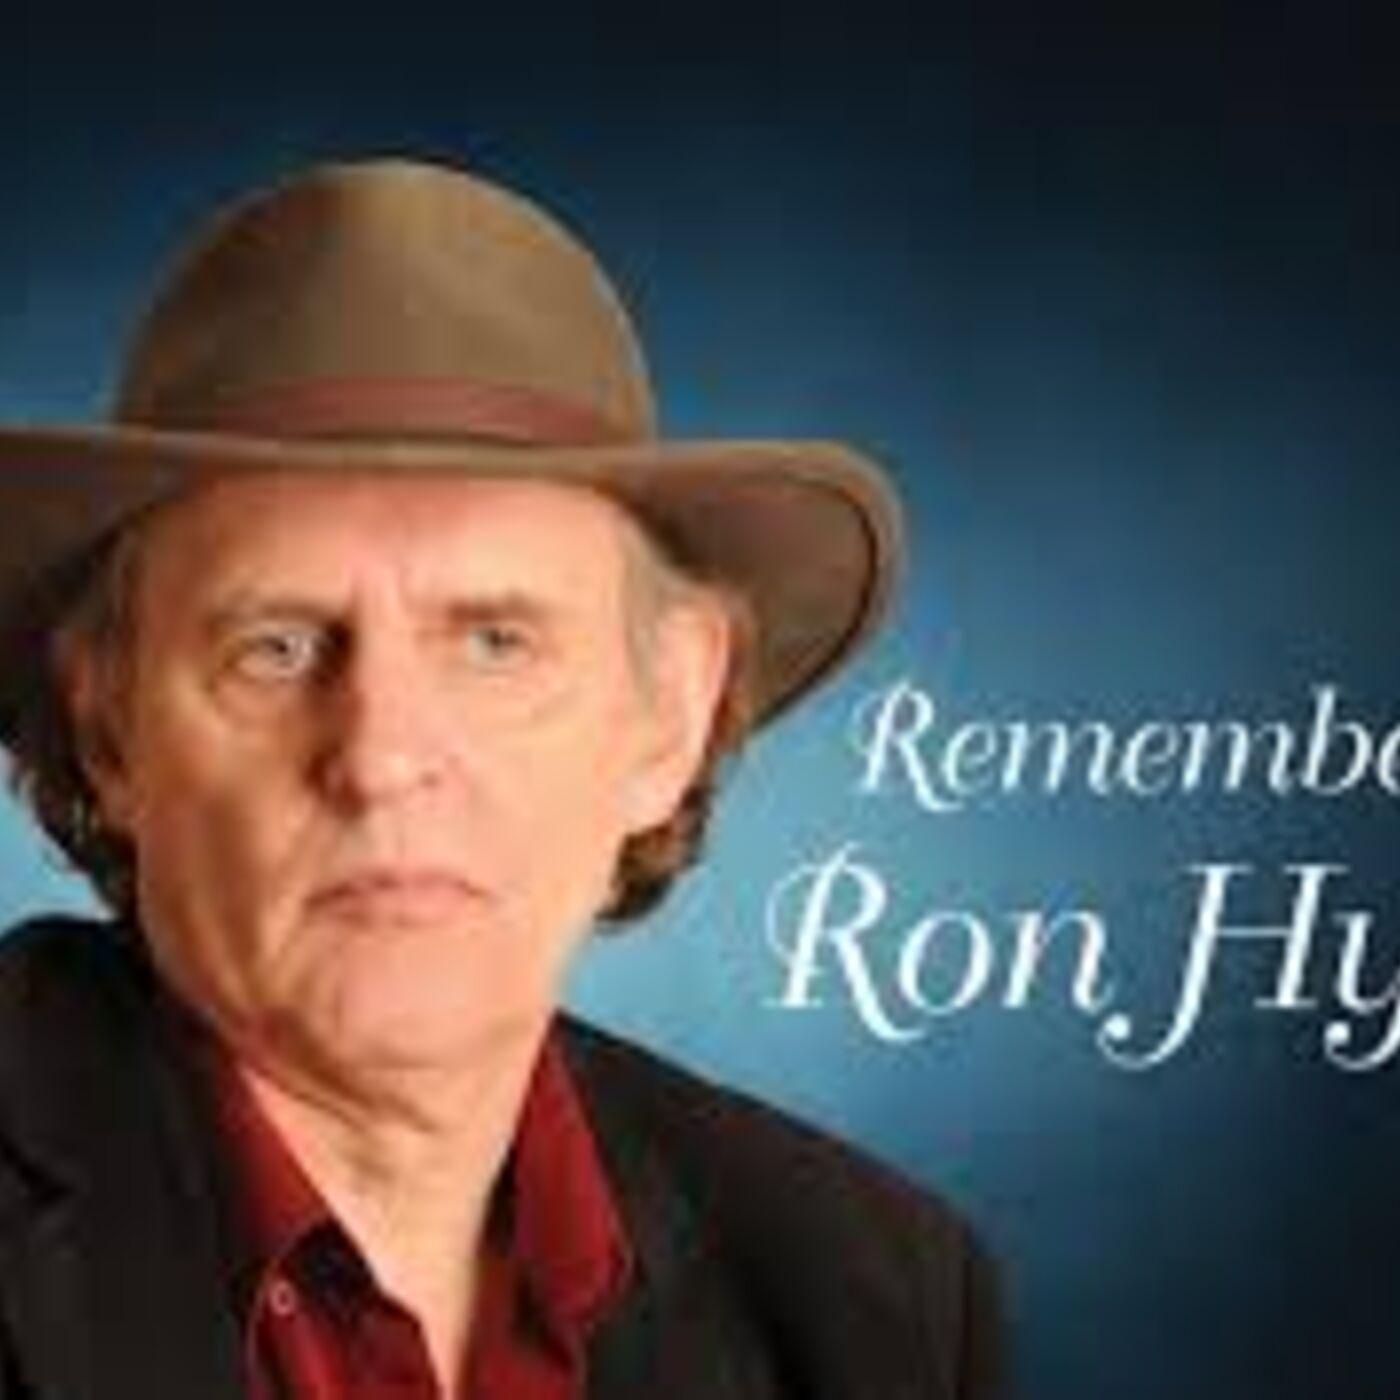 Episode No.111 Remembering Ron Hynes (December 7, 1950-November 19, 2015) Part 1